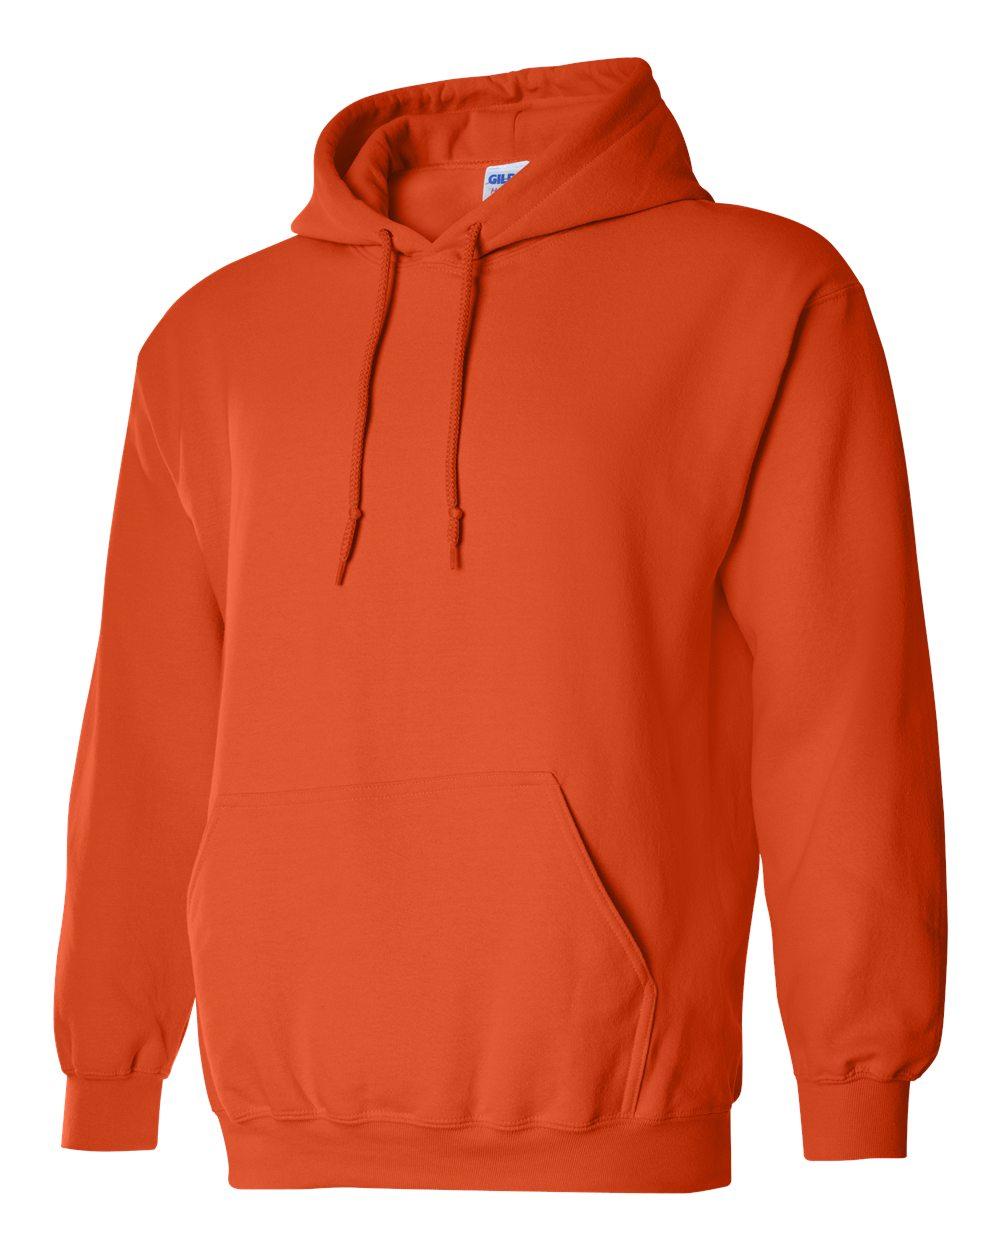 Gildan Heavy Blend Hooded Sweatshirt GI18500 Orange